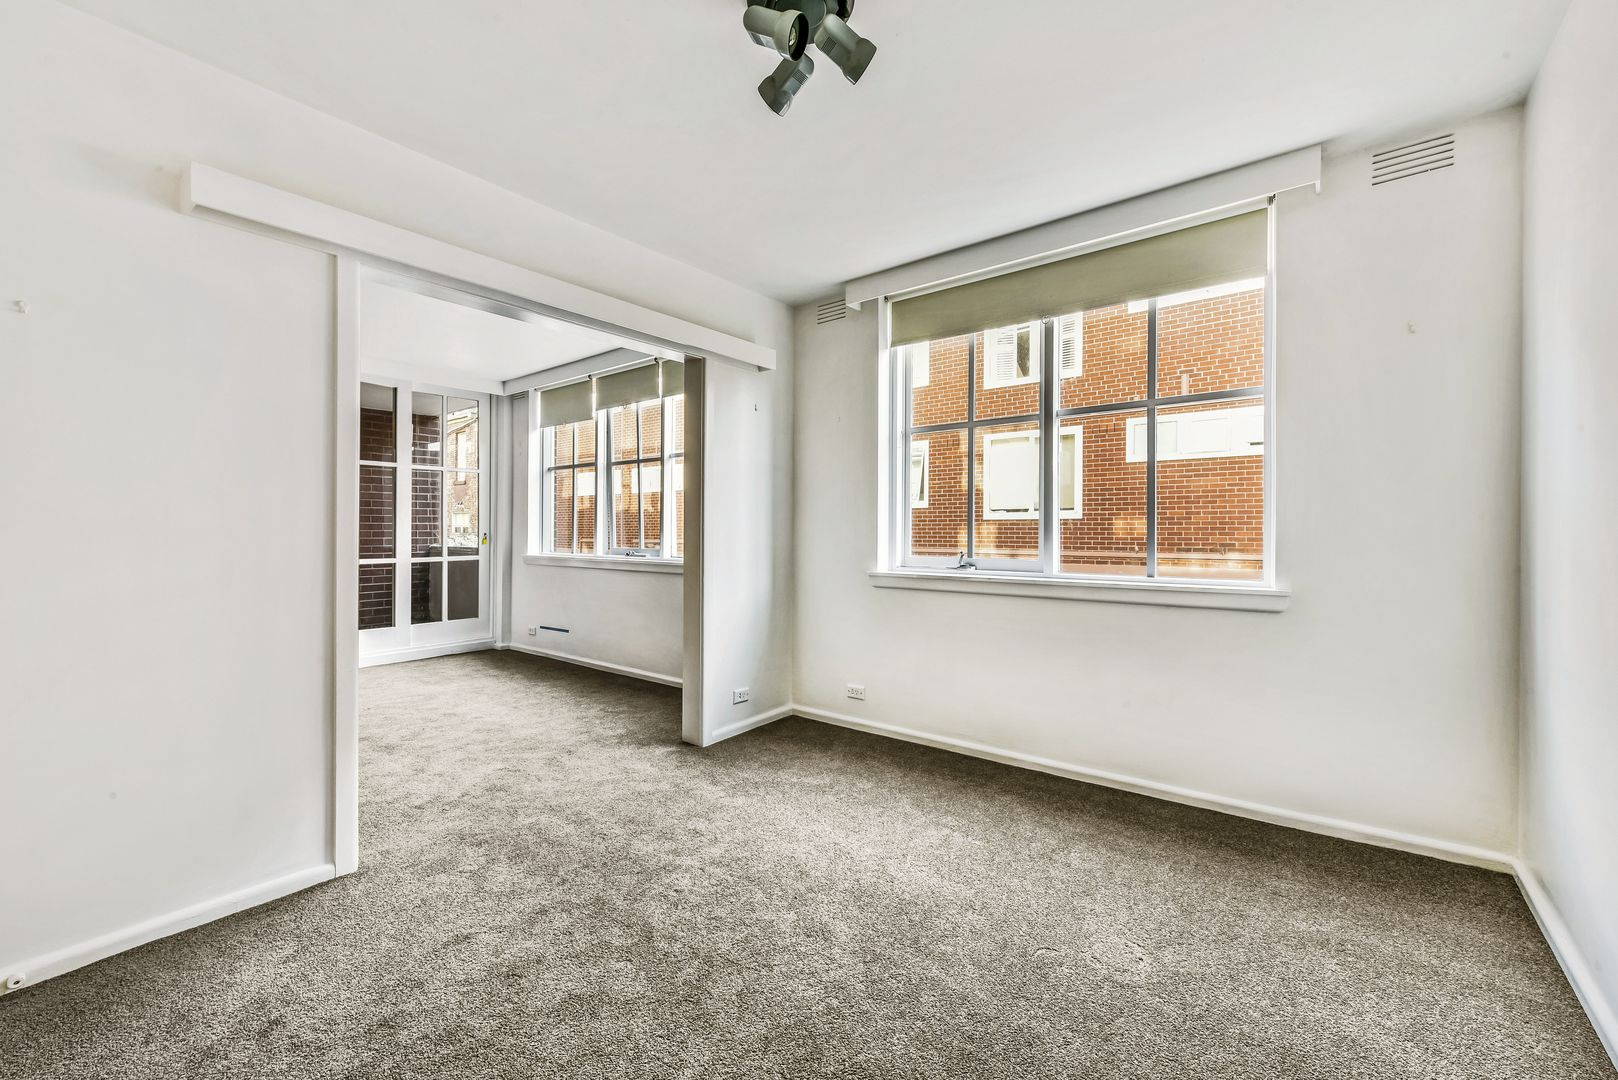 2/21 Powlett Street, East Melbourne VIC 3002, Image 0